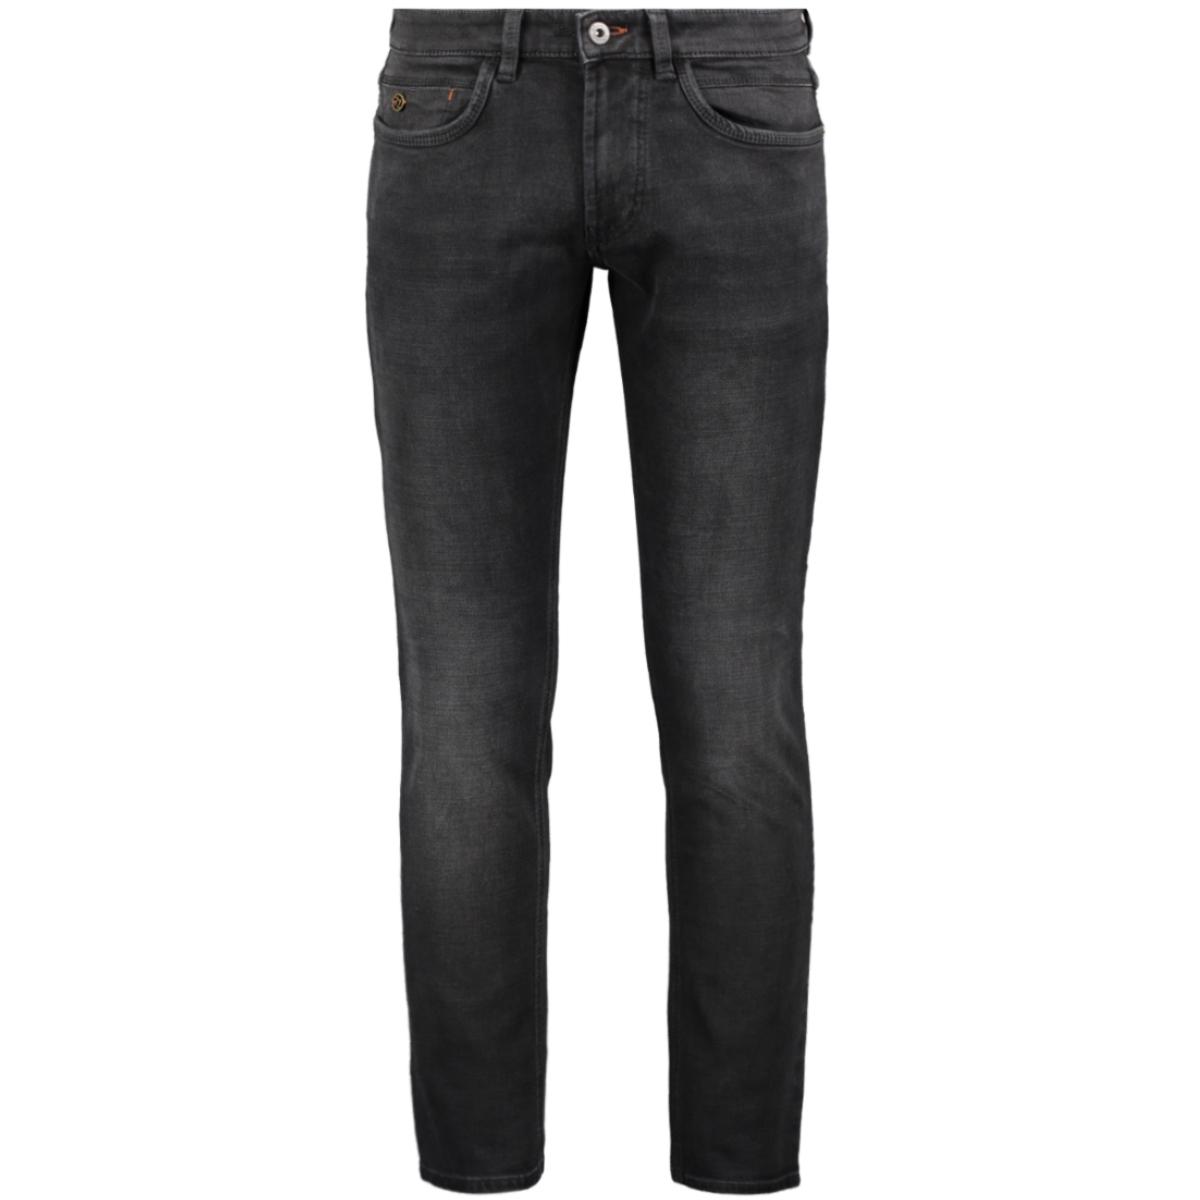 5 pocket harris  9690 688495 hattric jeans 08